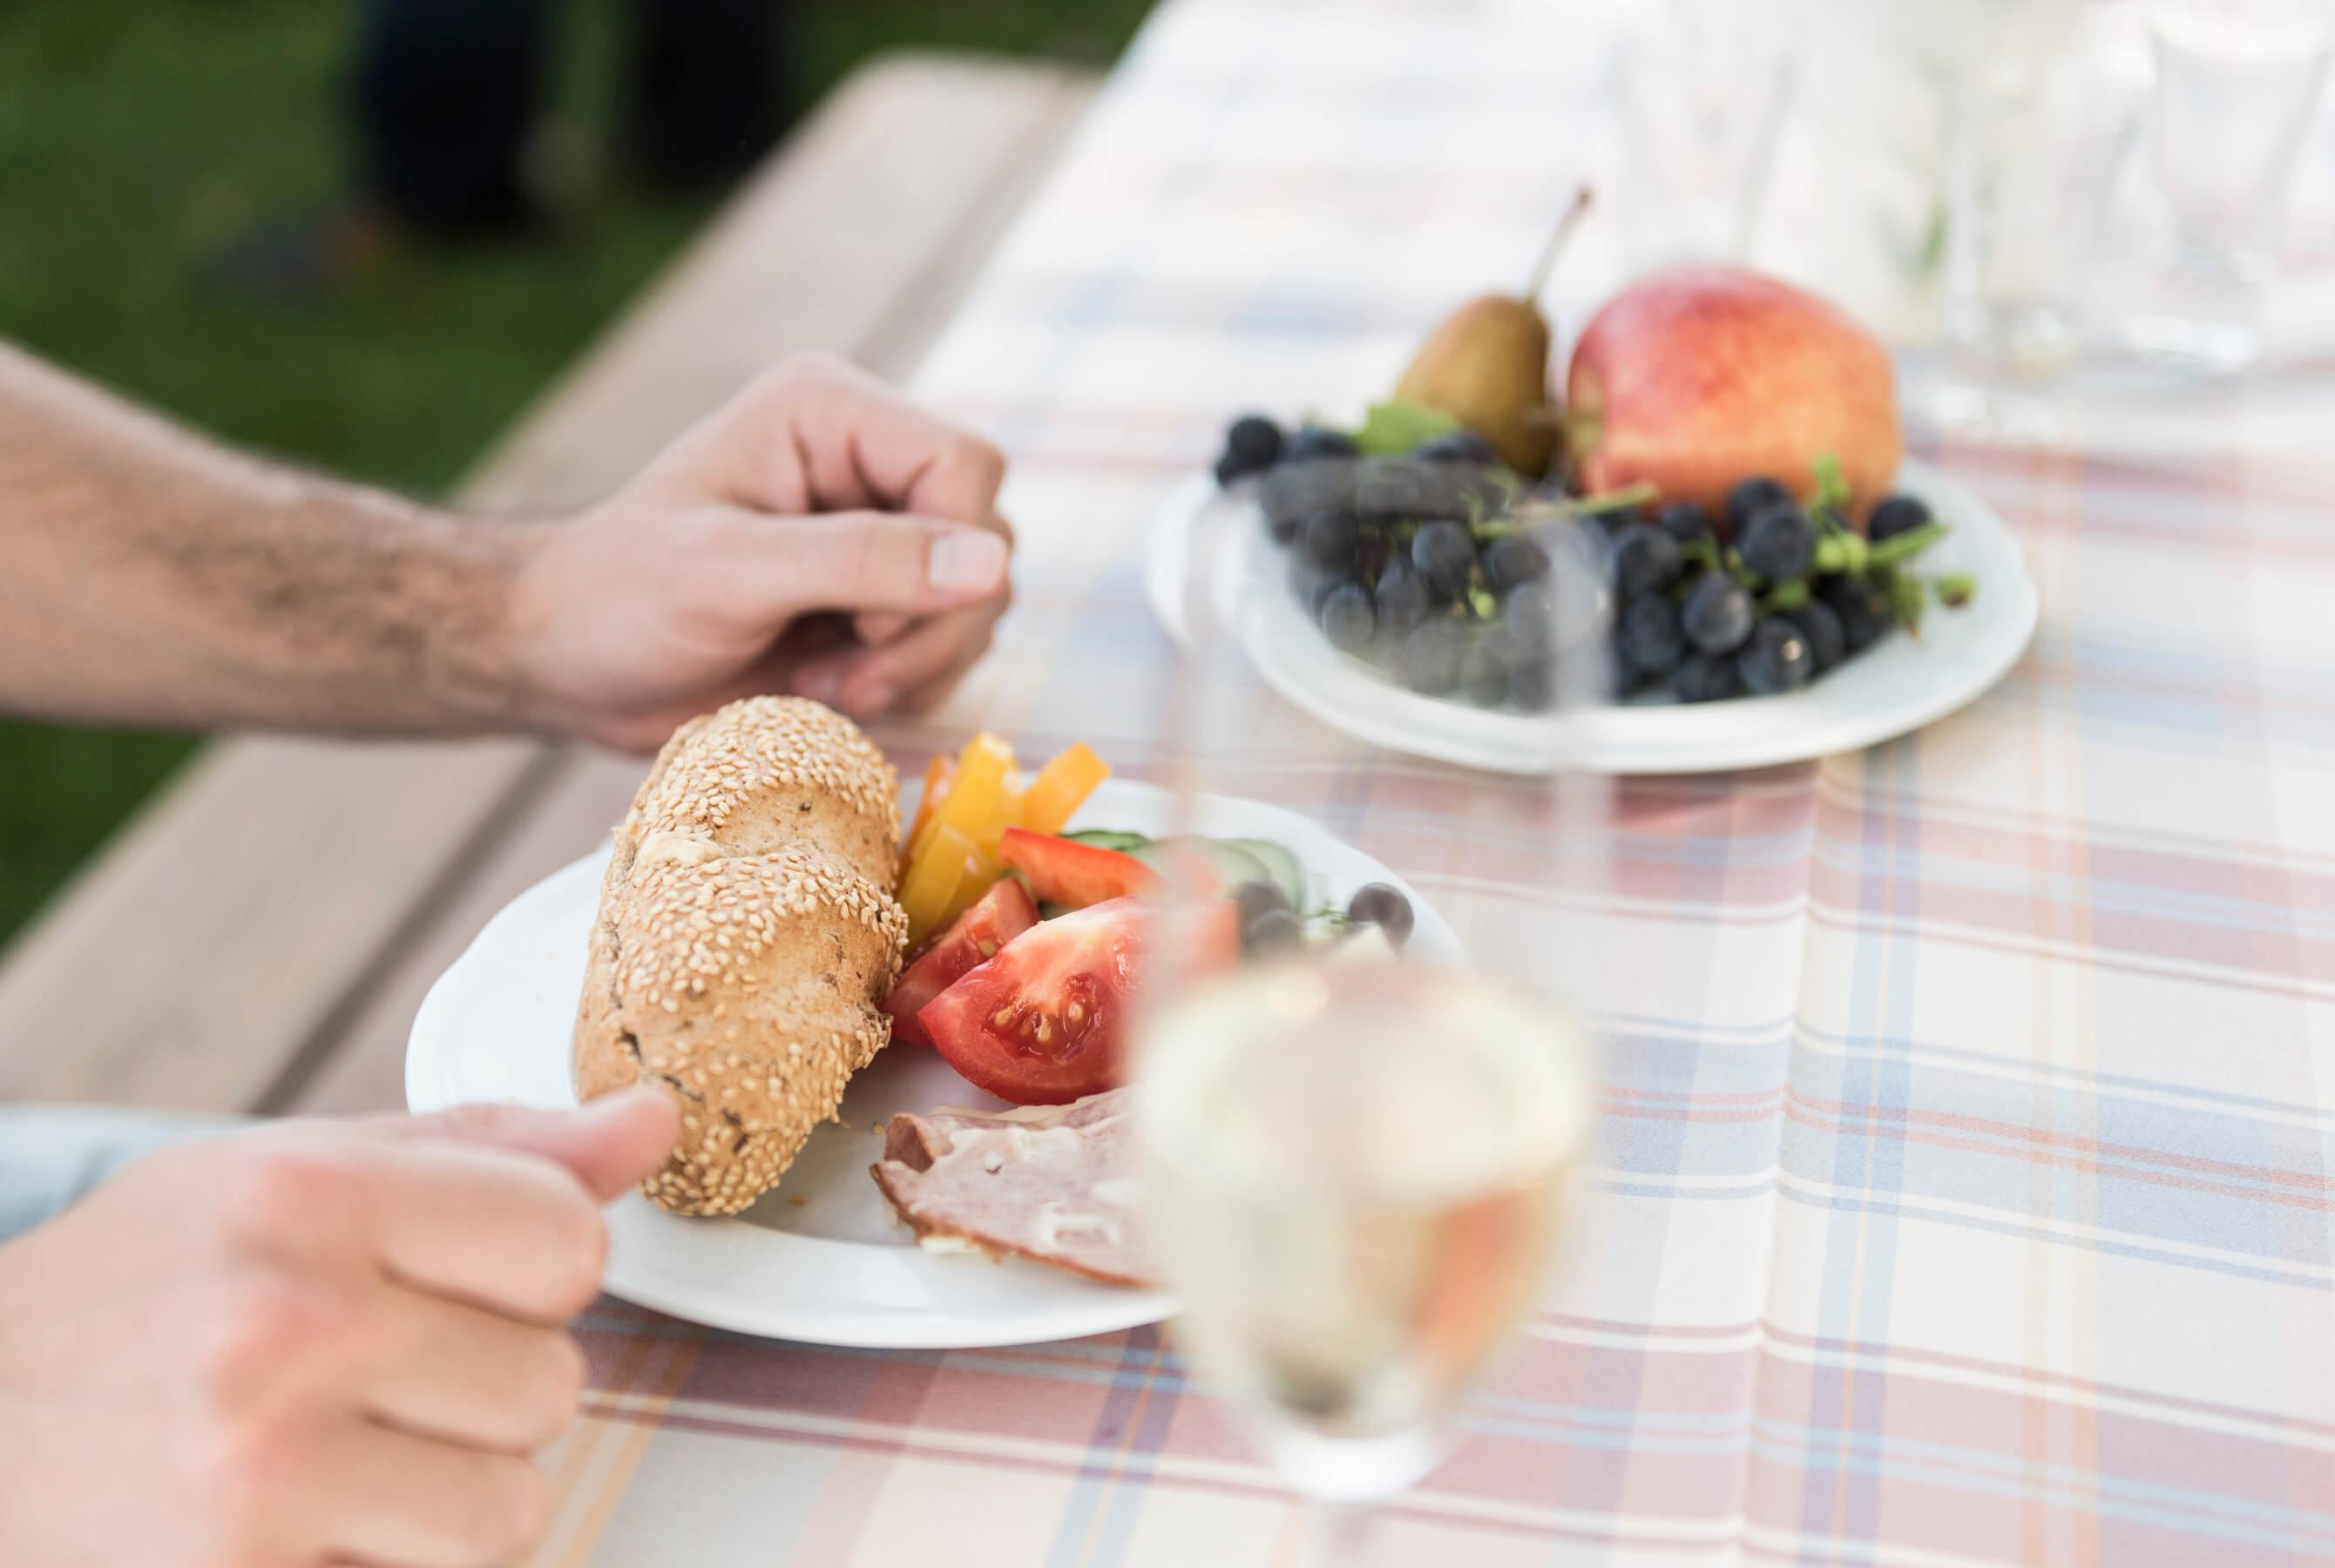 Picknick, Frühstück